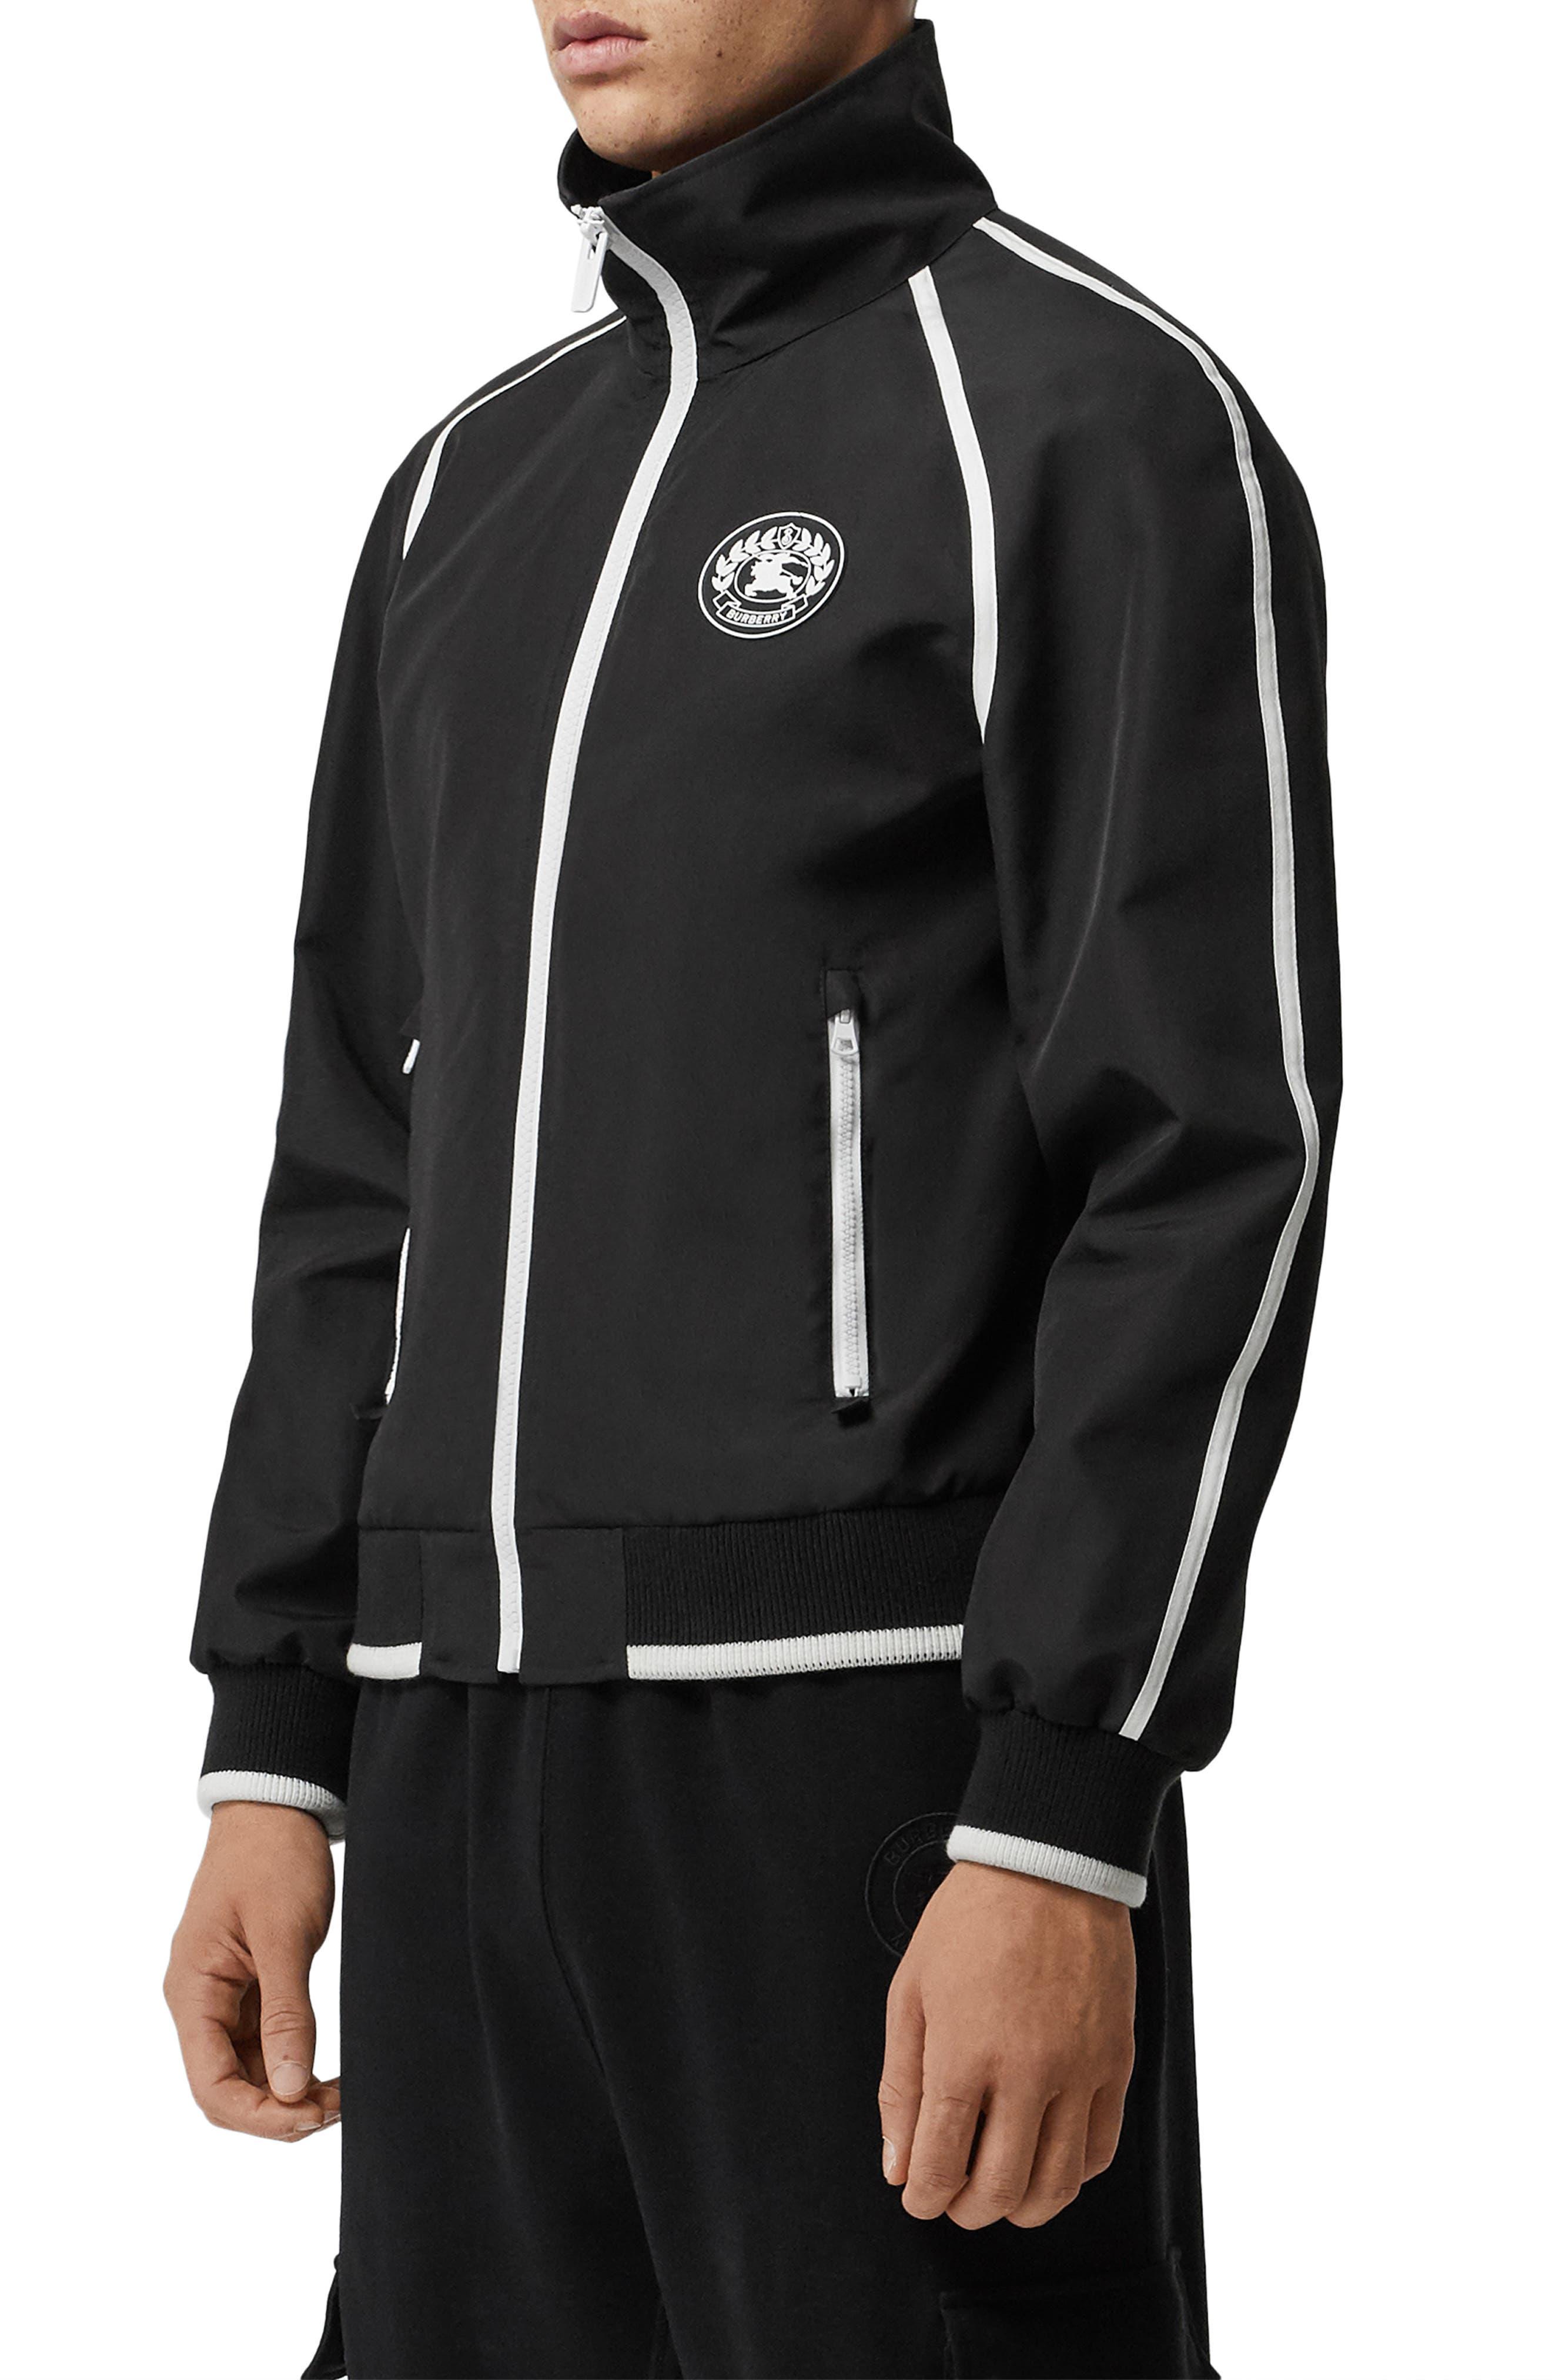 BURBERRY, Northfield Nylon Track Jacket, Alternate thumbnail 3, color, BLACK